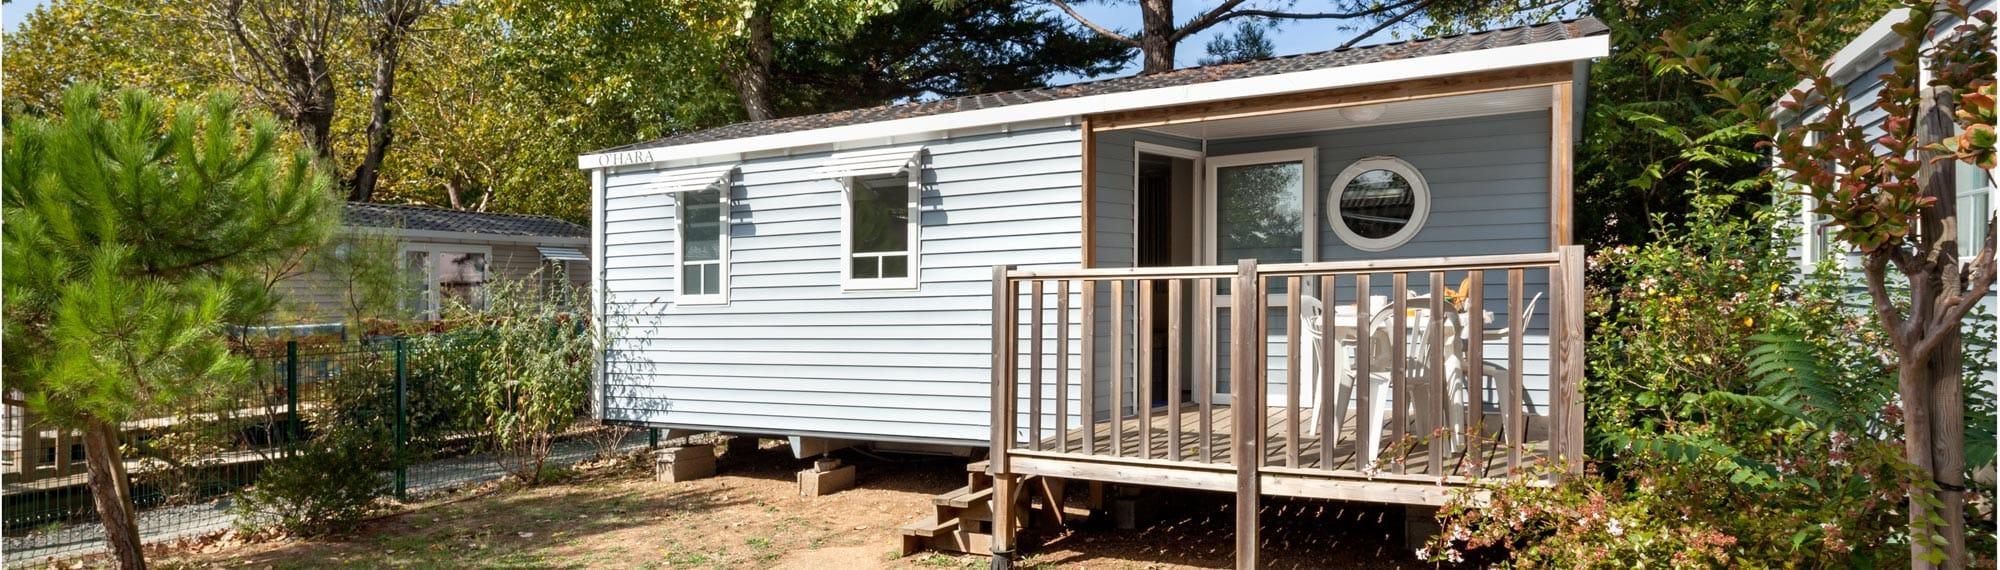 Location mobil home 4 pers 2 chambres chatelaillon plage la rochelle - Camping le port neuf la rochelle ...